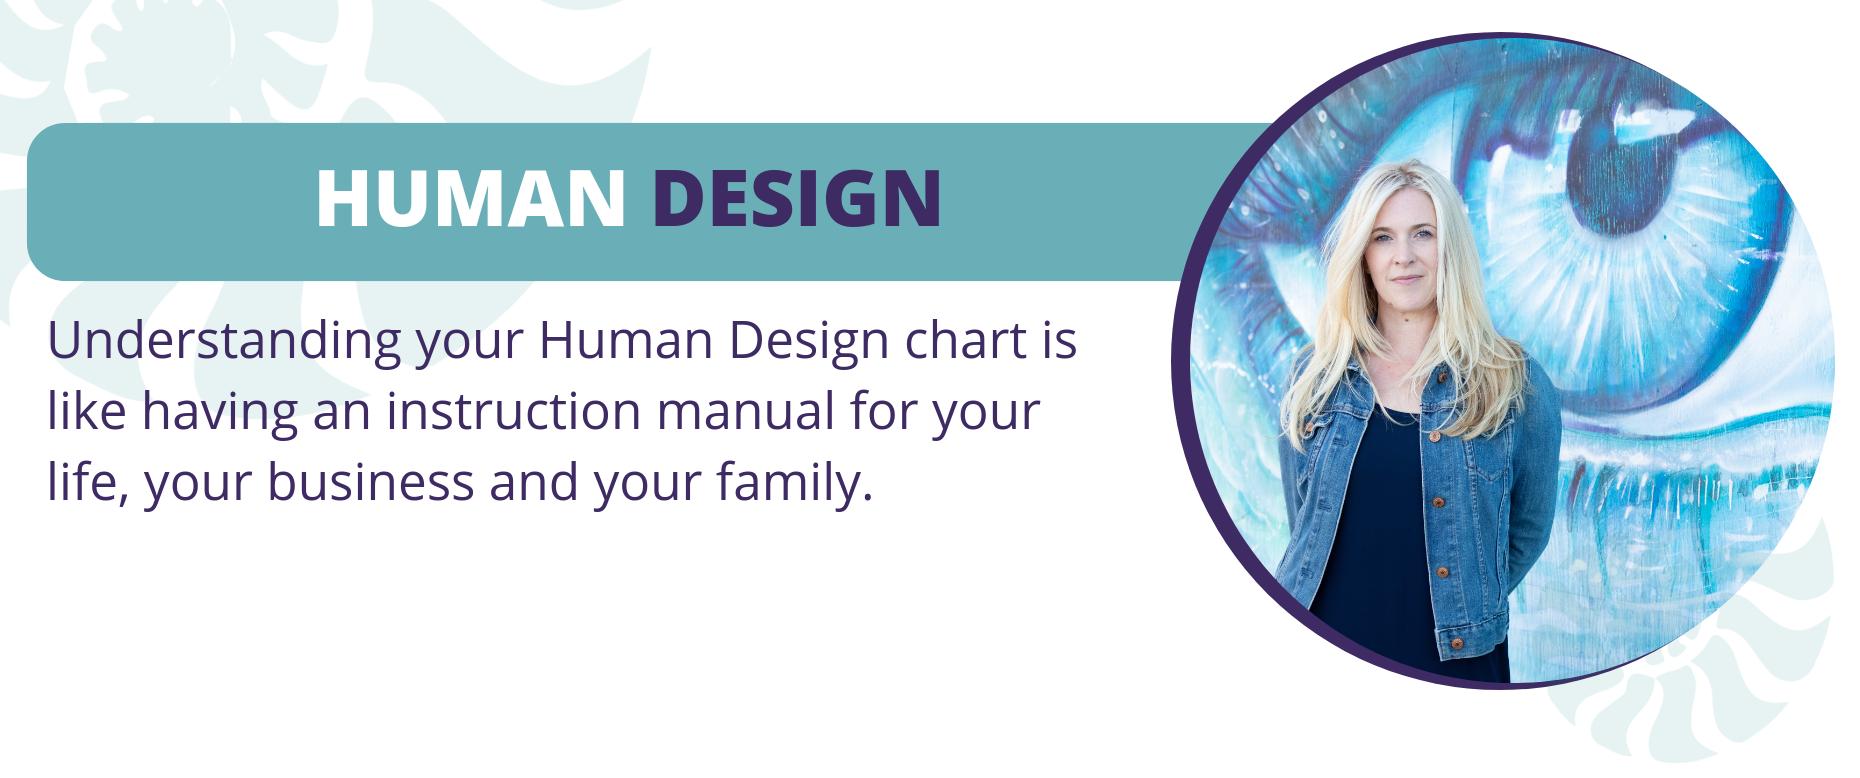 Human Design Header 11%2F28.png